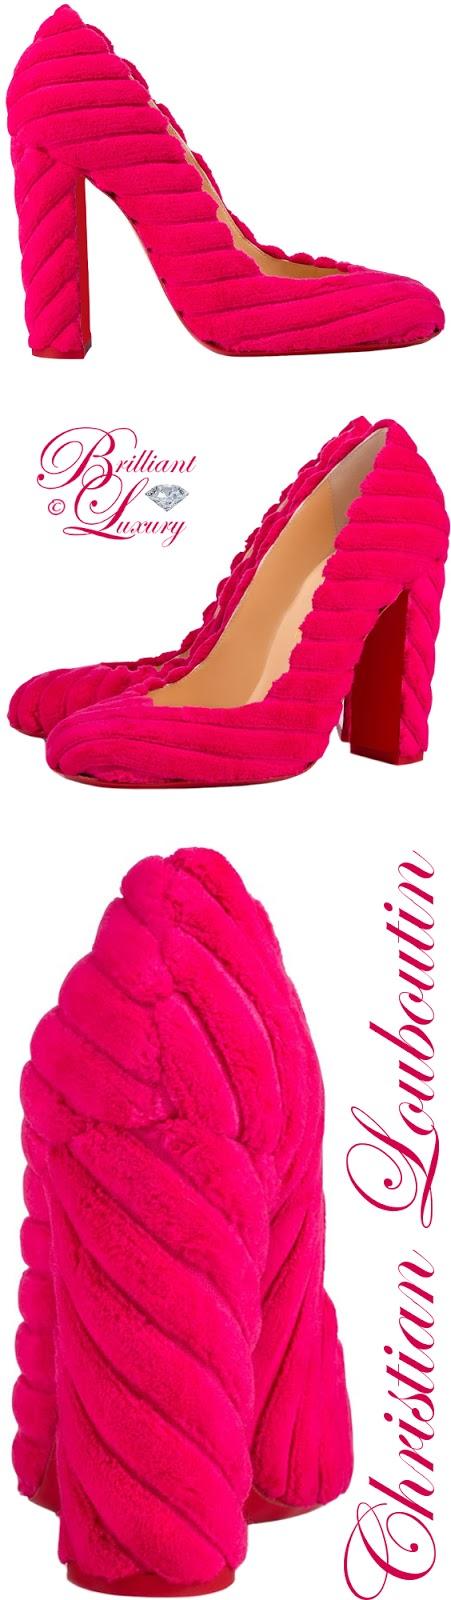 Brilliant Luxury ♦ Christian Louboutin Cadrilla Ultra Rose Velvet Pump